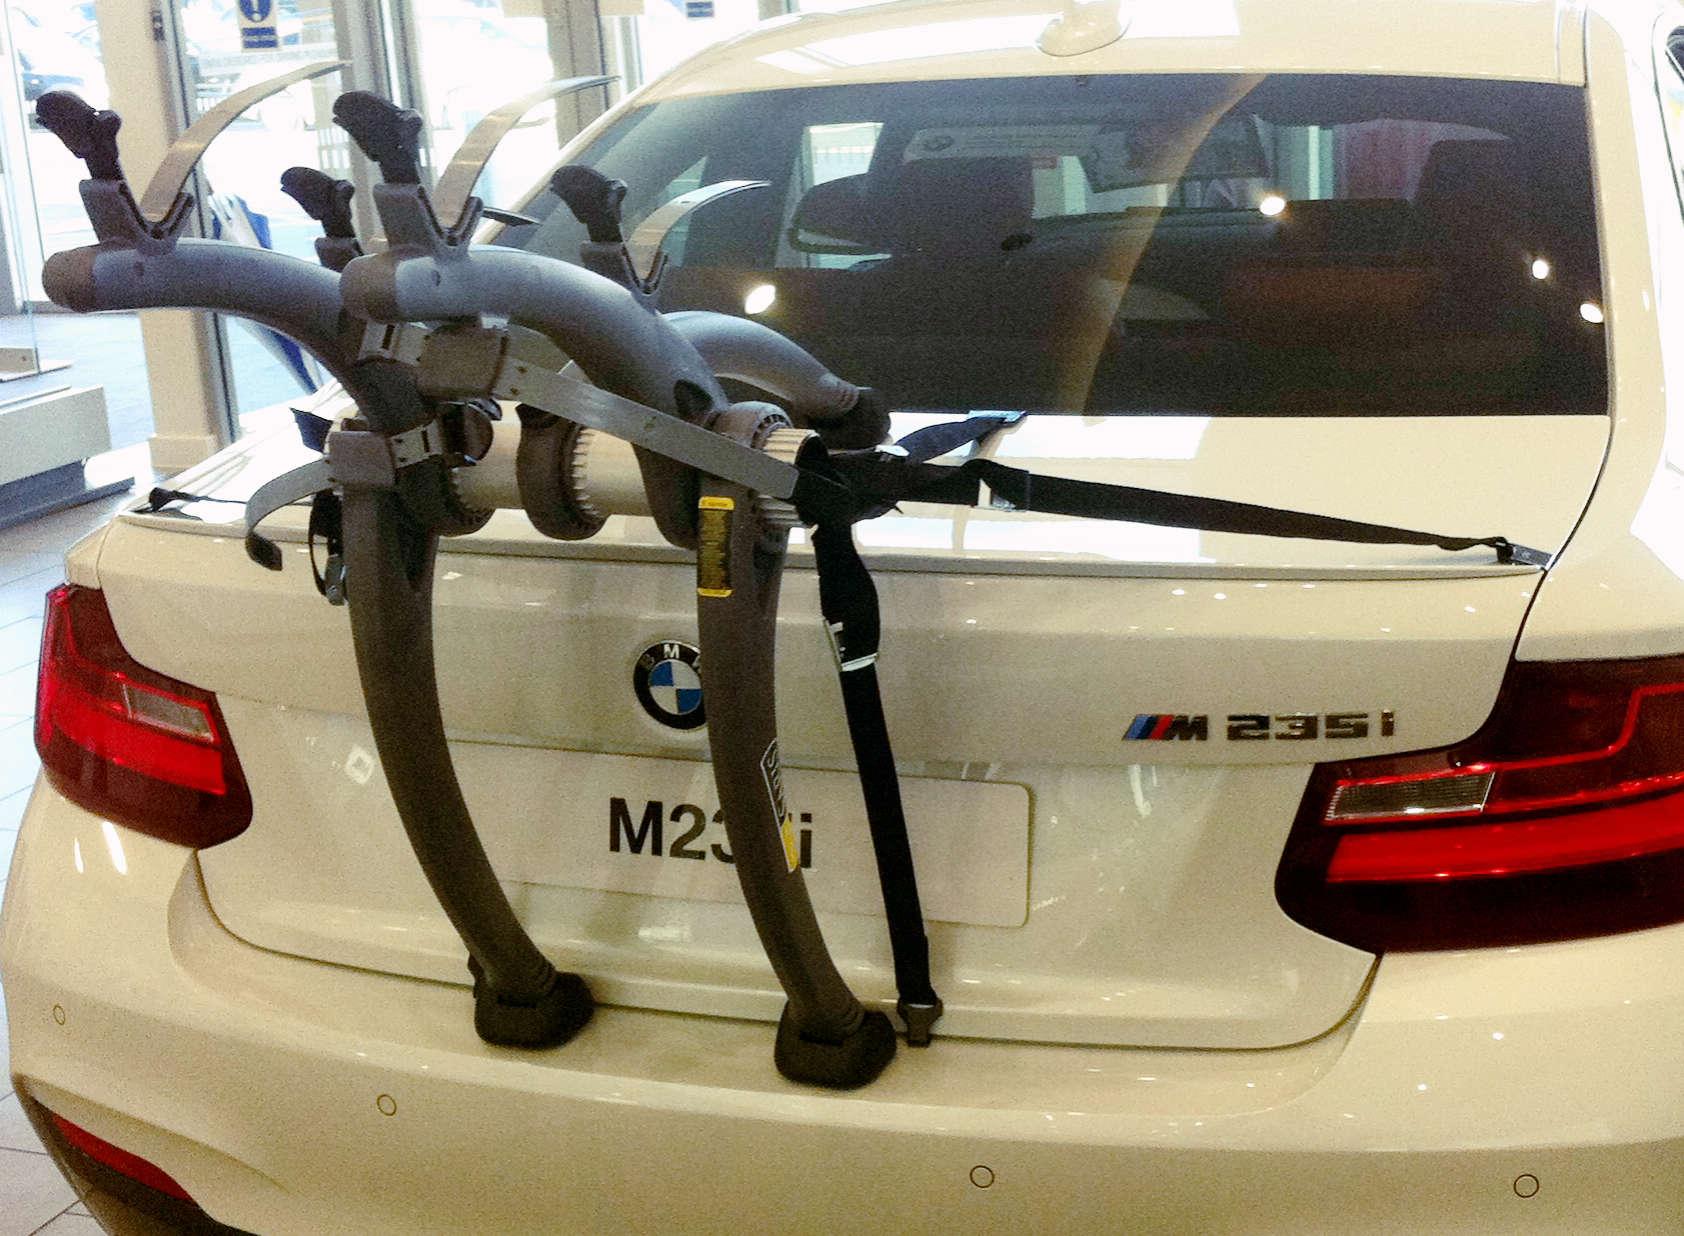 Bmw 2 Series Bike Rack For Coupe Modern Arc Based Design